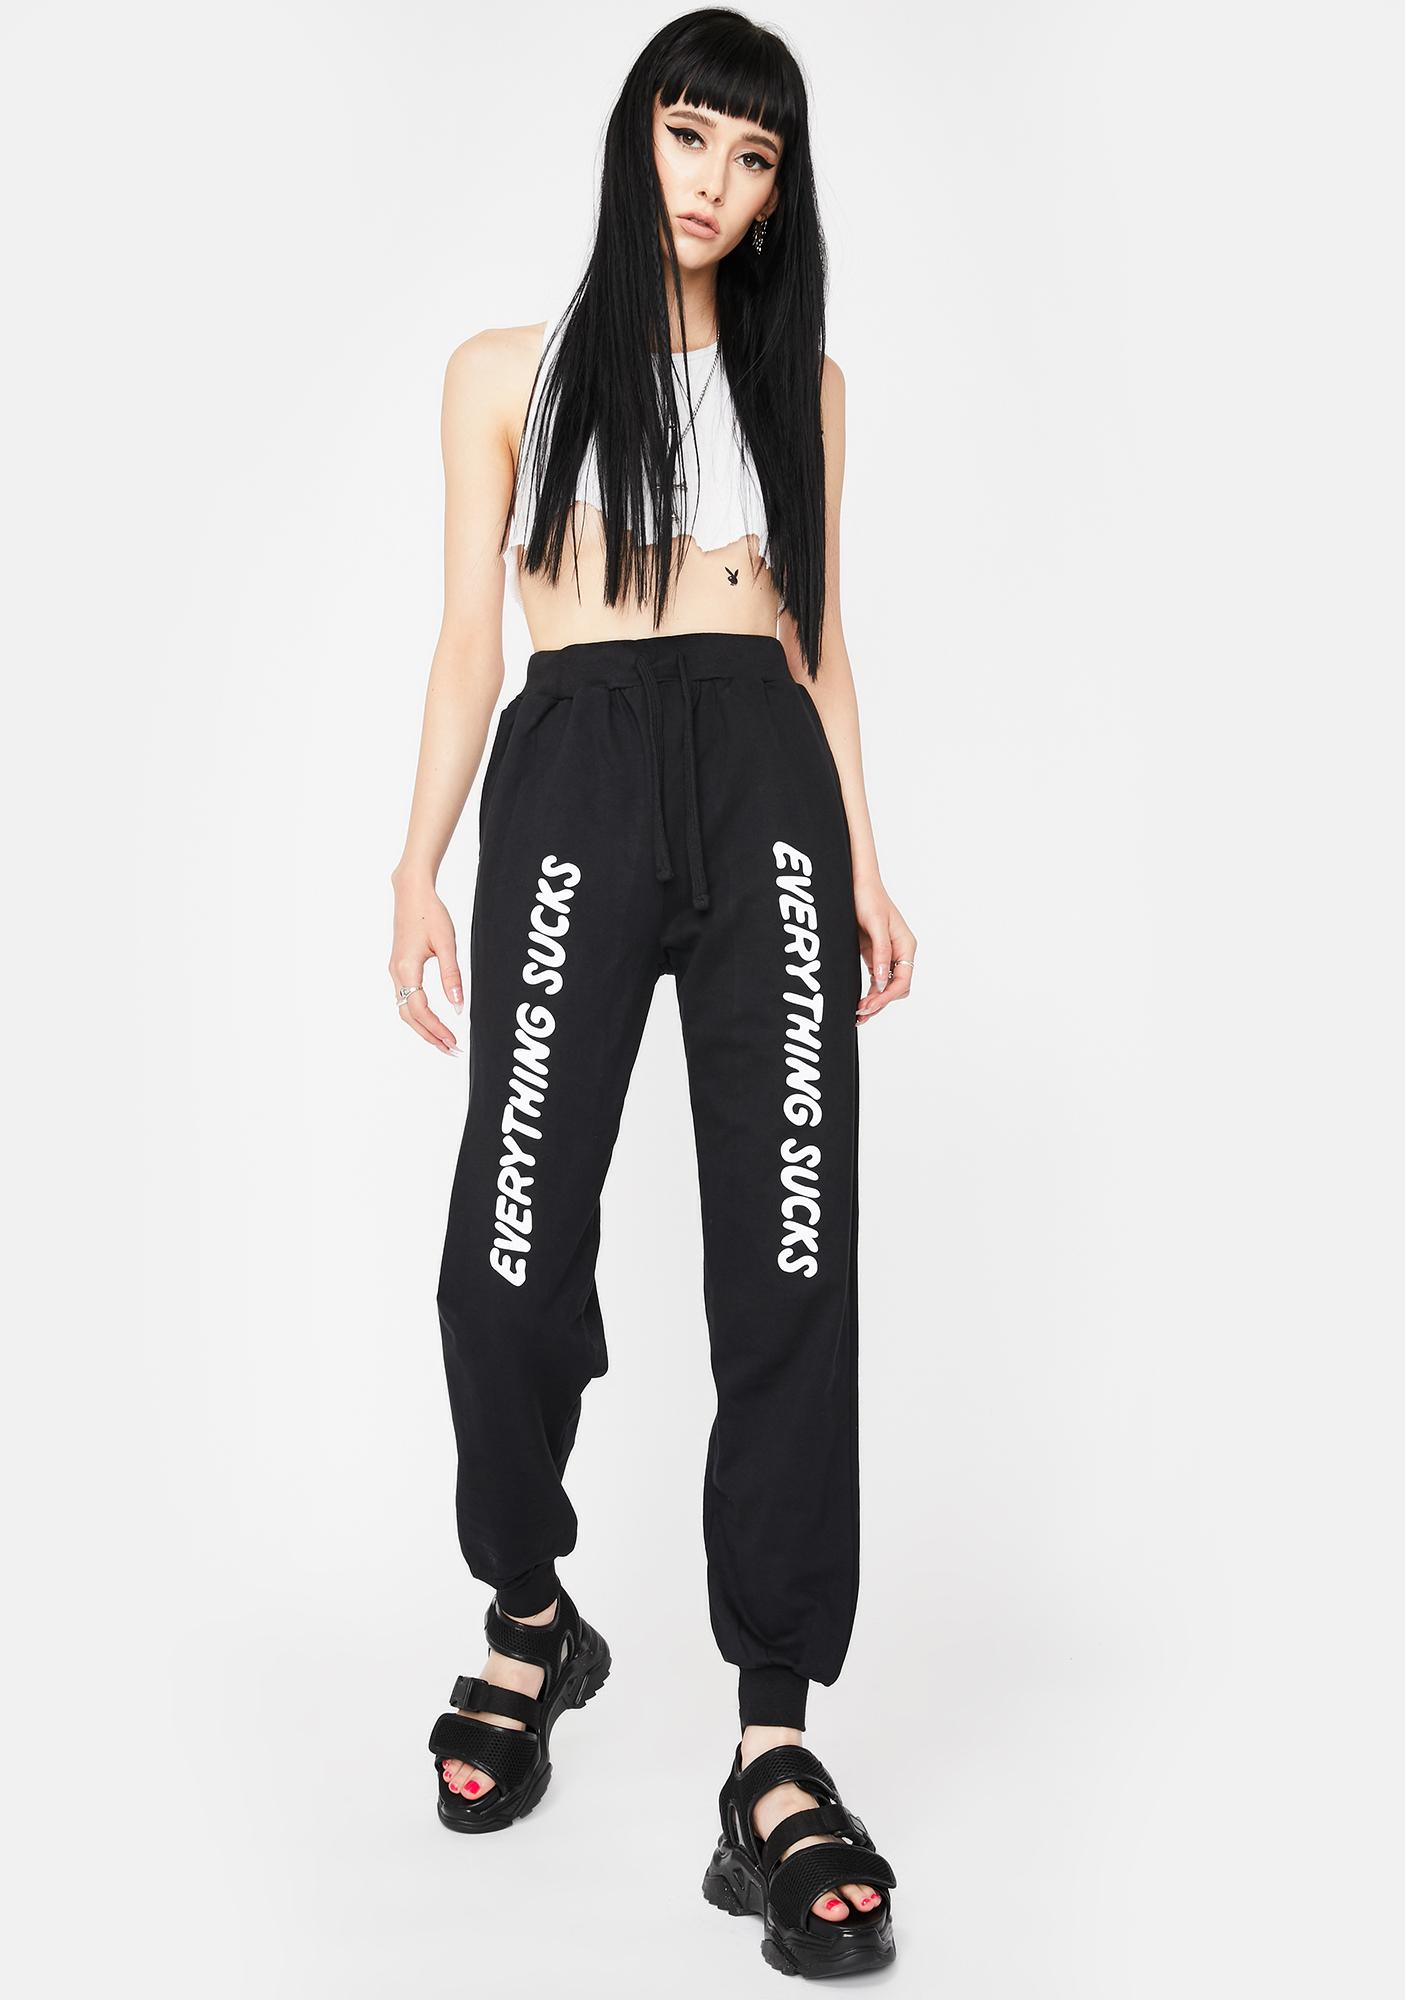 Long Clothing Everything Sucks Jogger Sweatpants